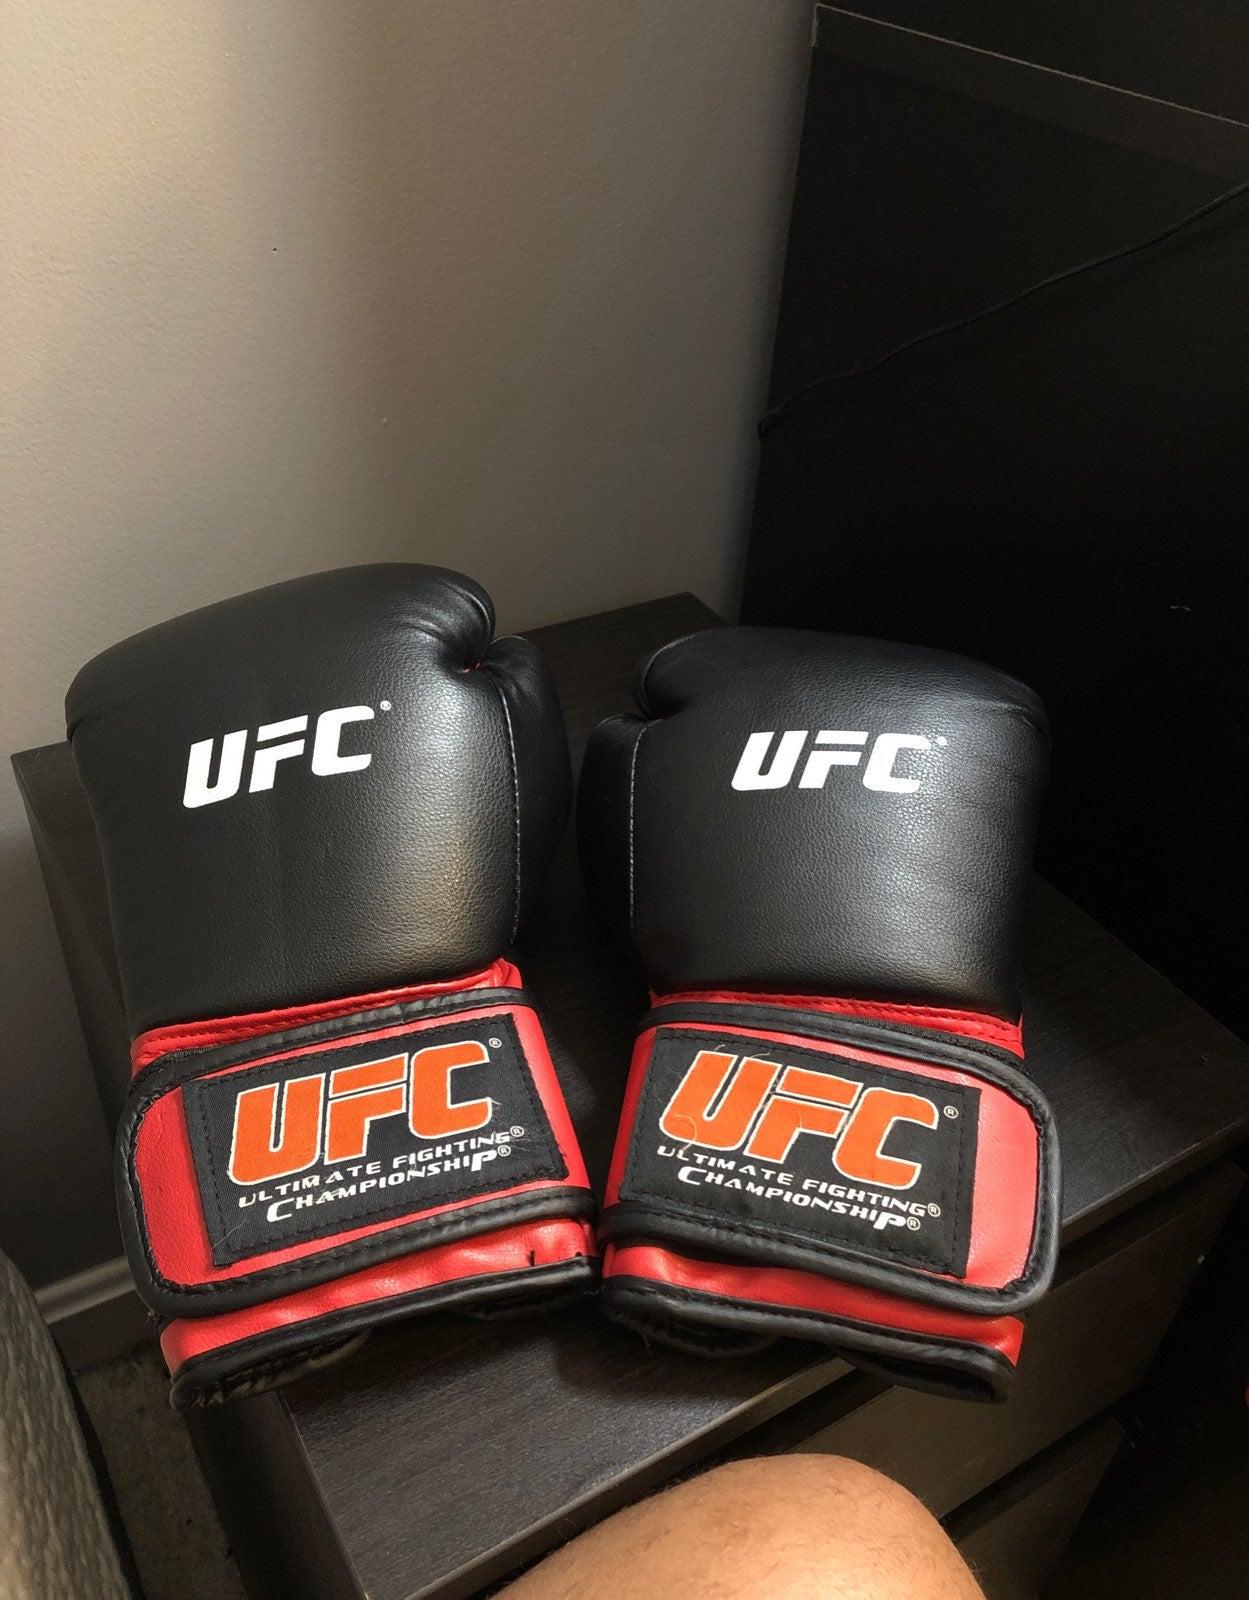 Ufc Boxing/Sparring gloves